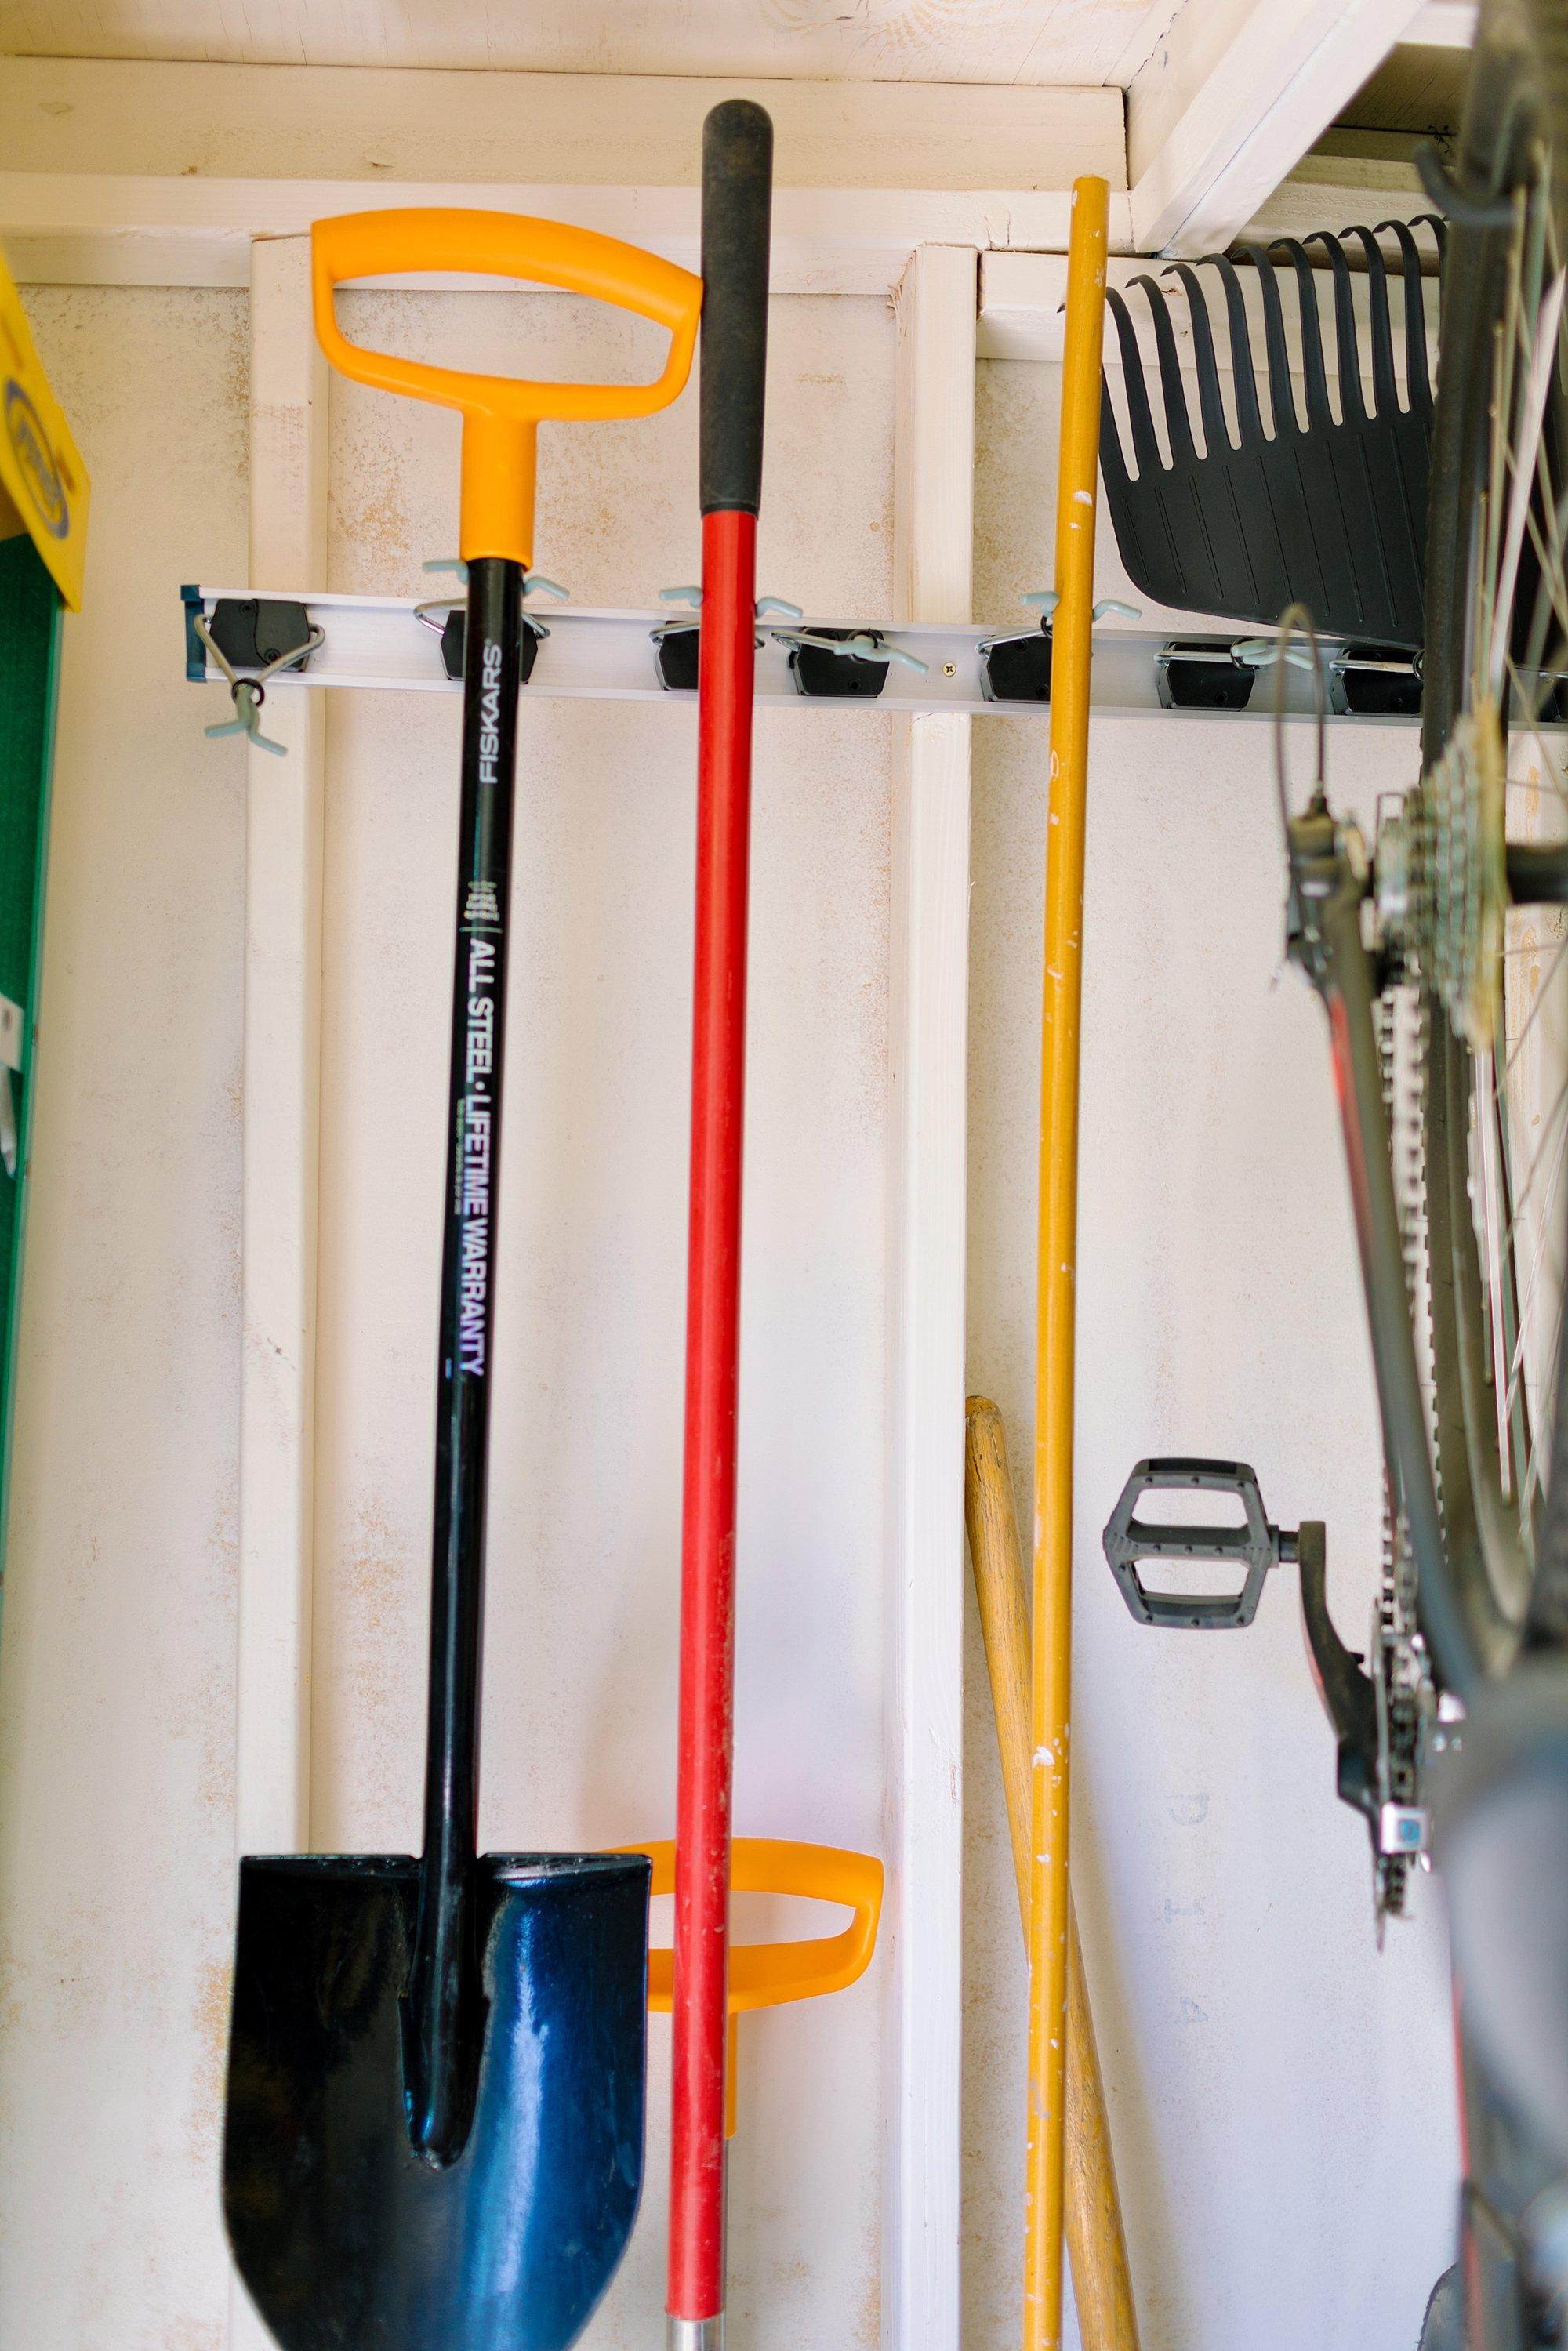 backyard tool shed Fiskars garden tools tour hang garden tools